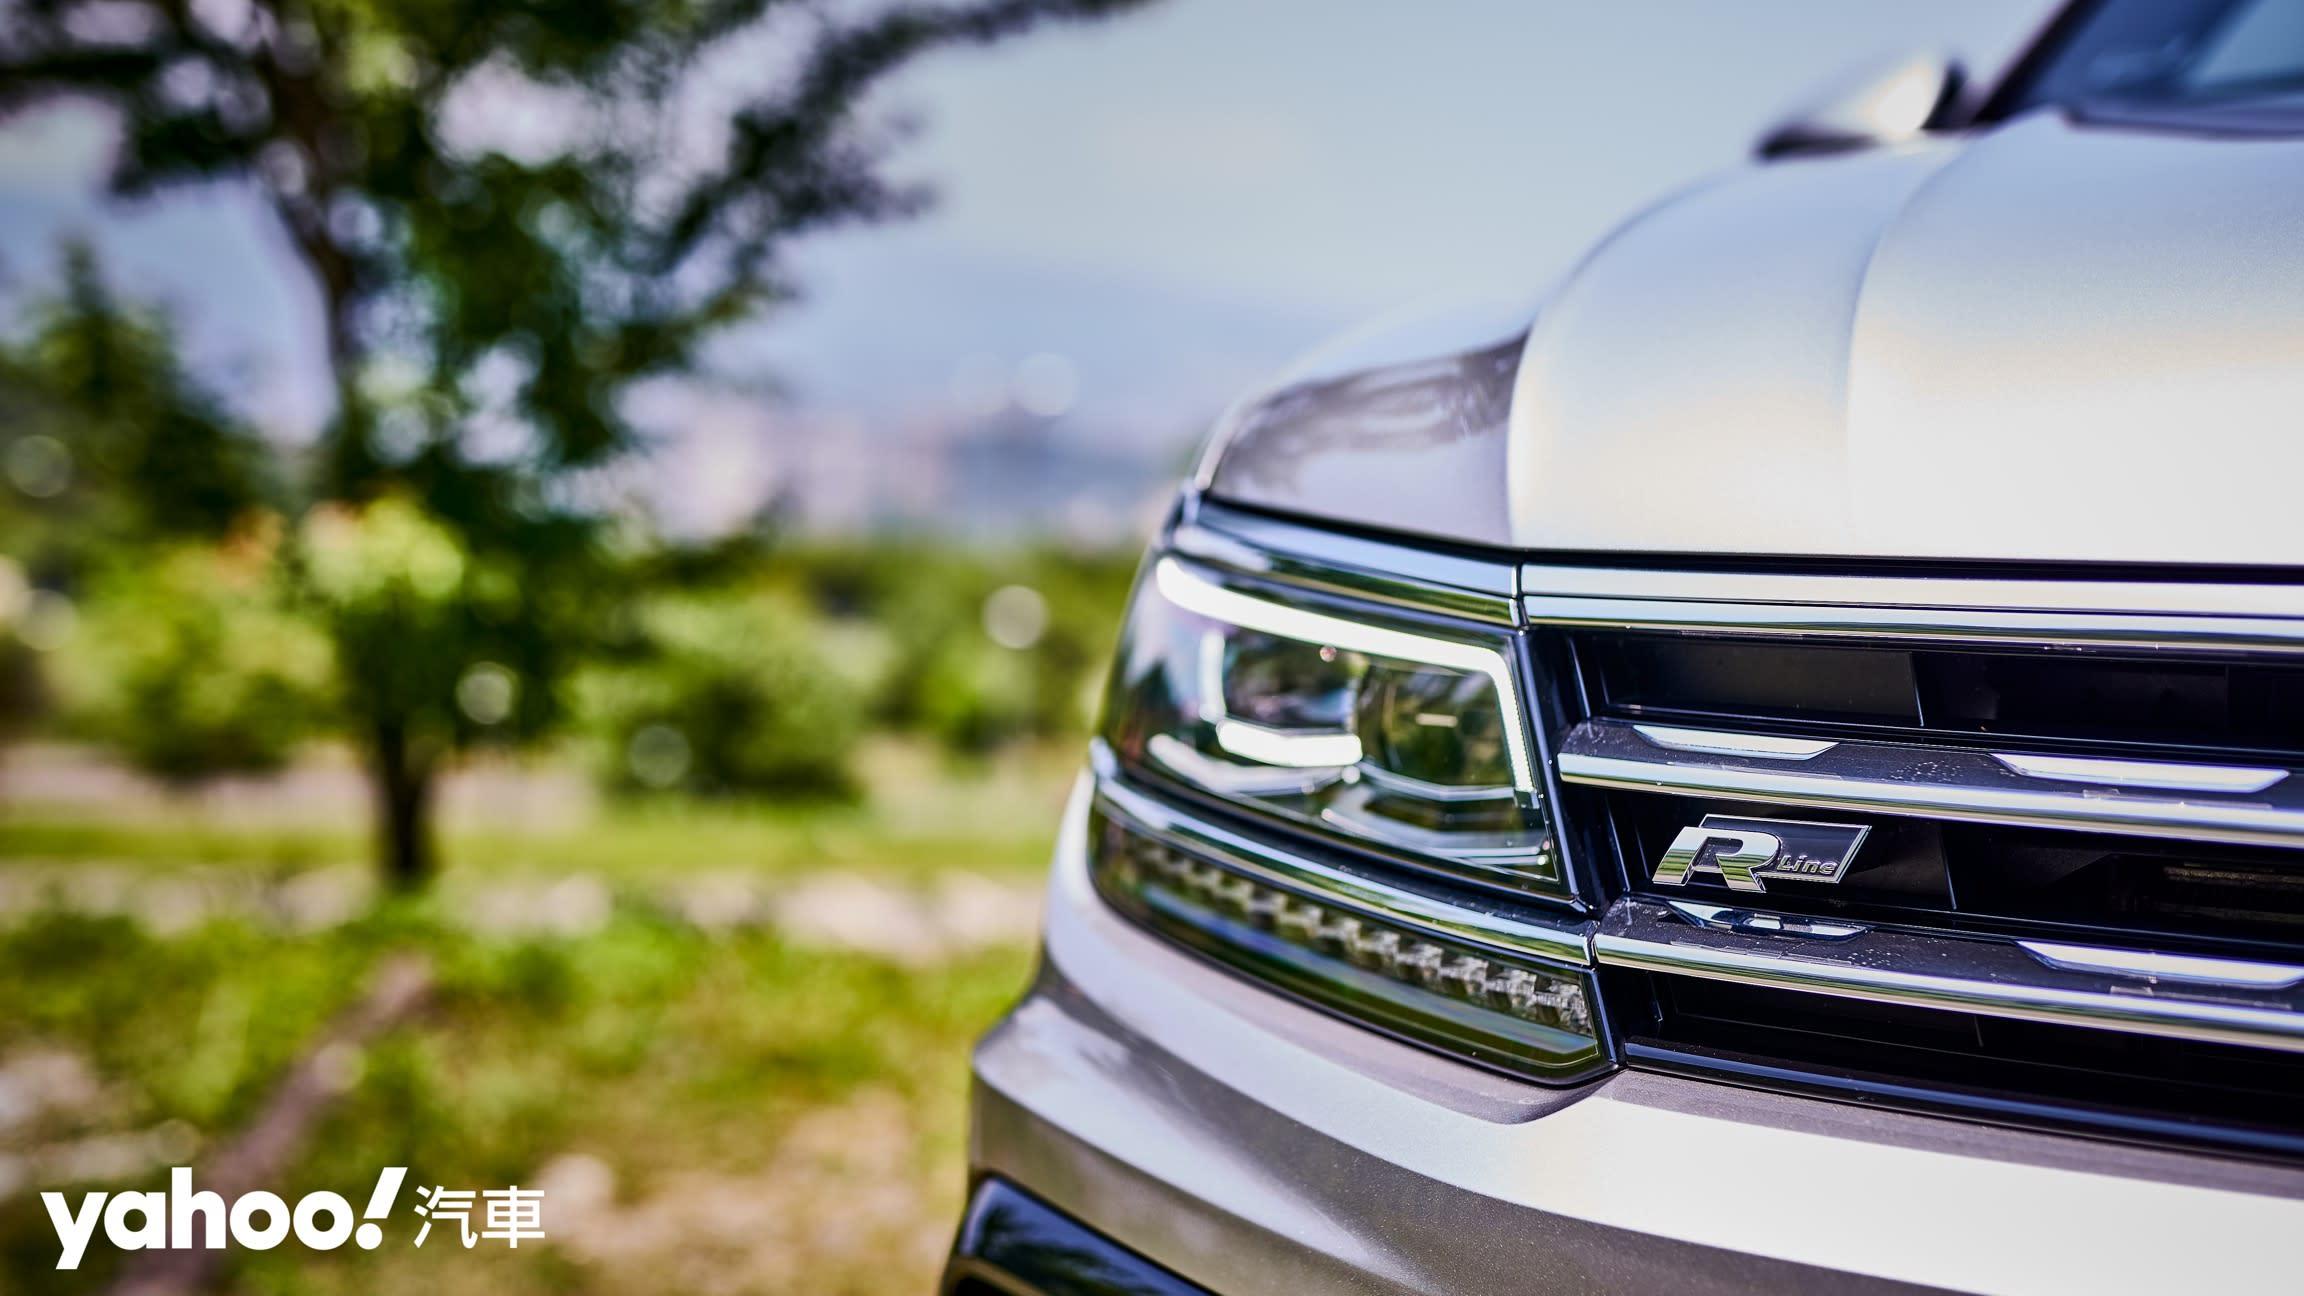 剛柔並濟所以值得!2020 Volkswagen Tiguan 380TSI R-Line Performance城郊試駕! - 4